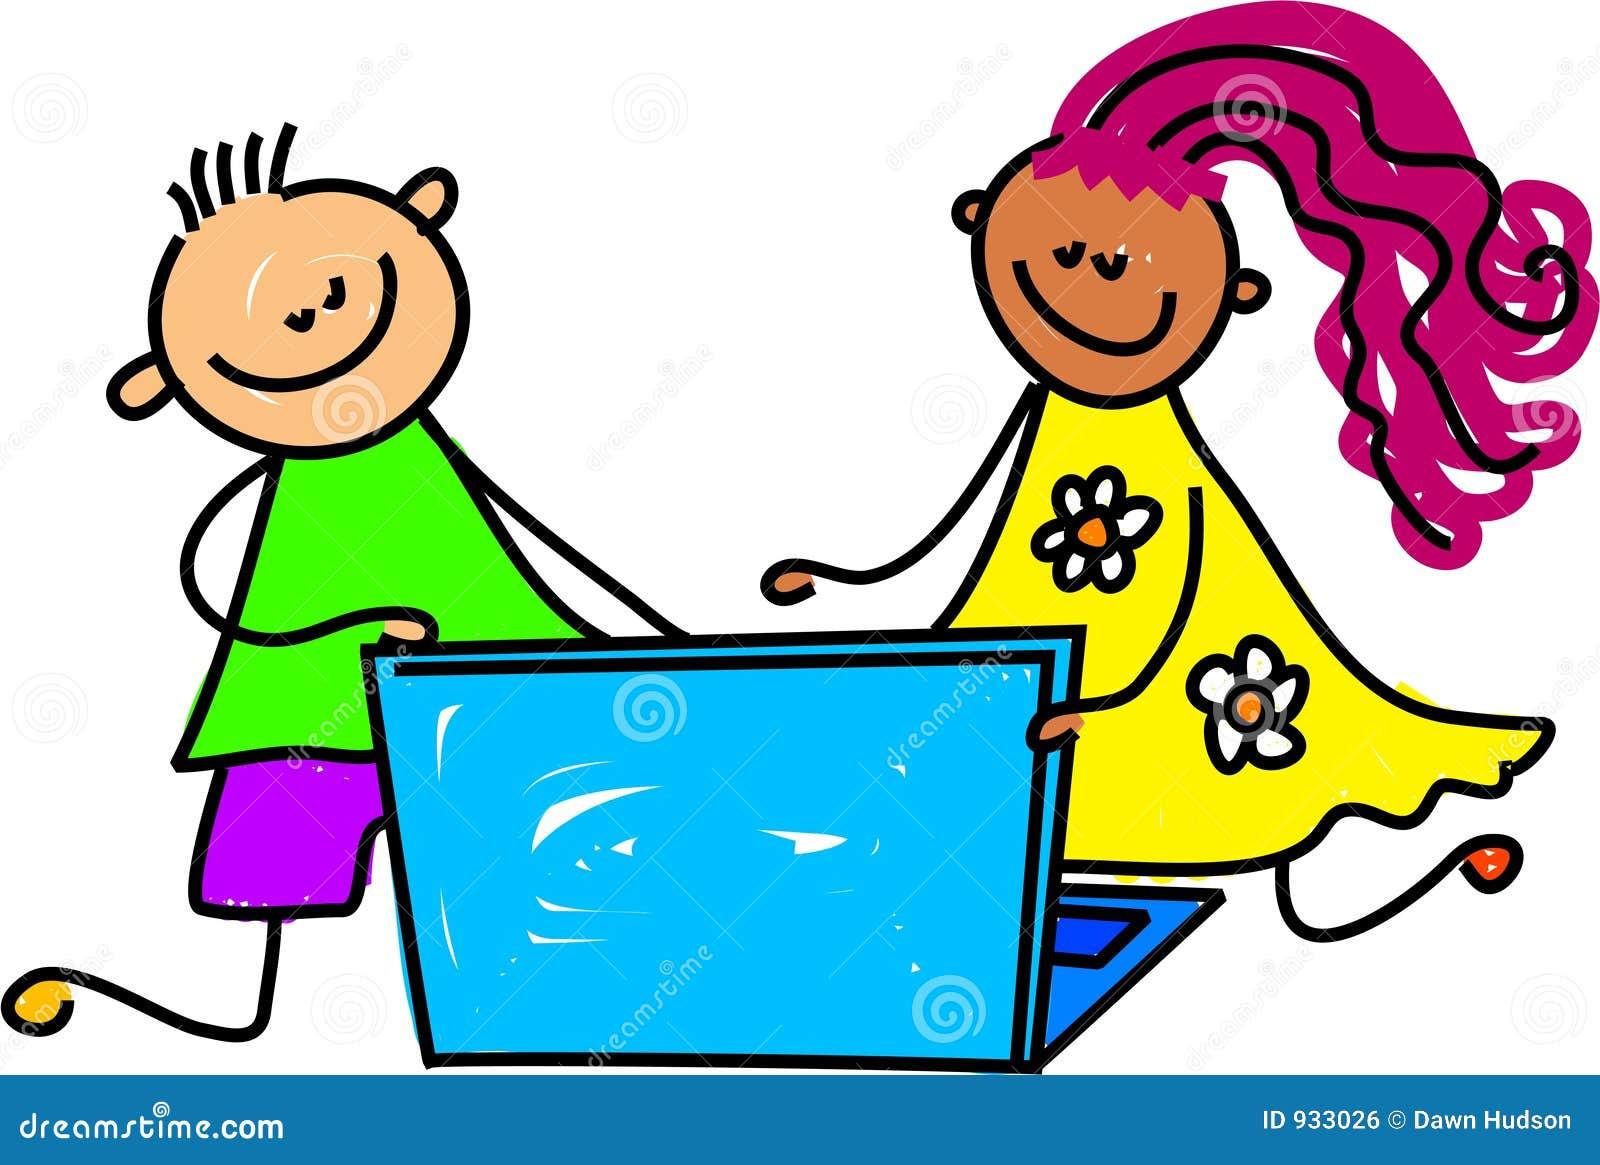 Laptop kids stock vector. Illustration of diversity ...